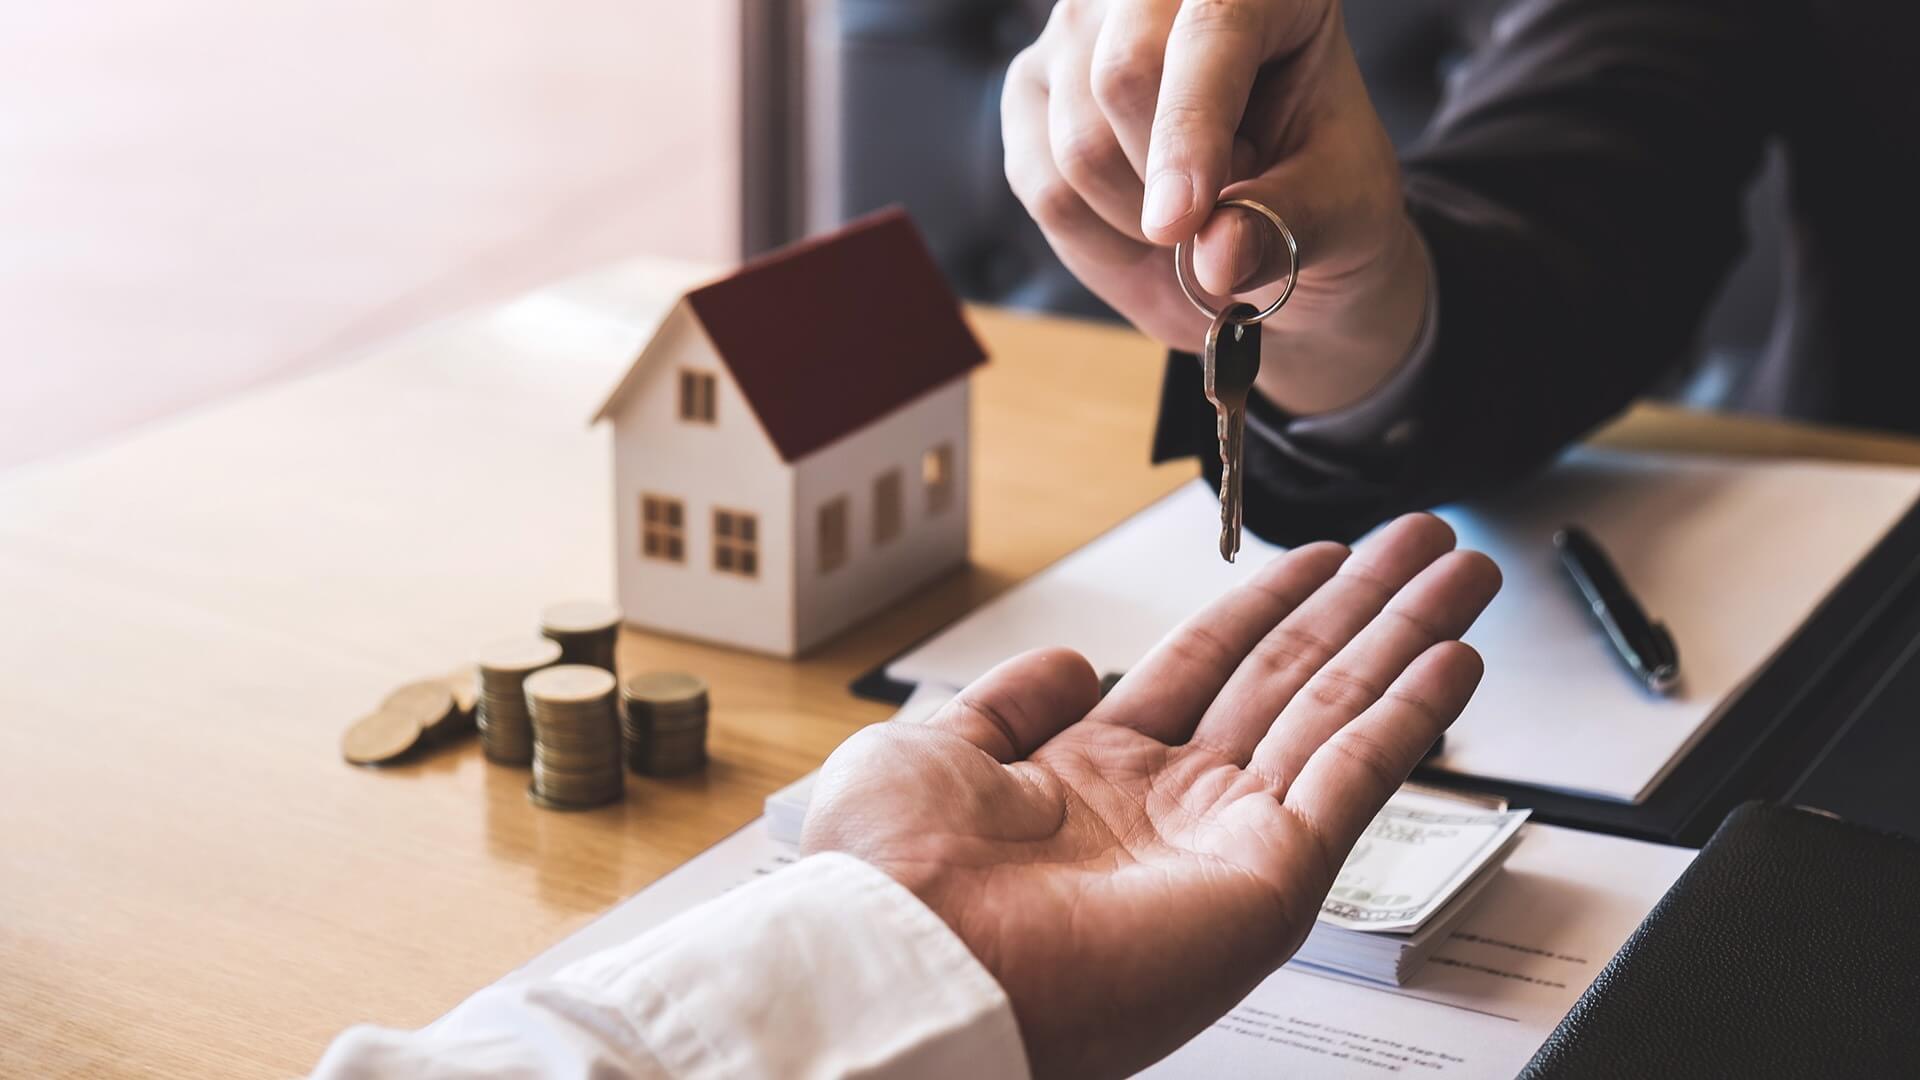 landlord handing keys to tenant